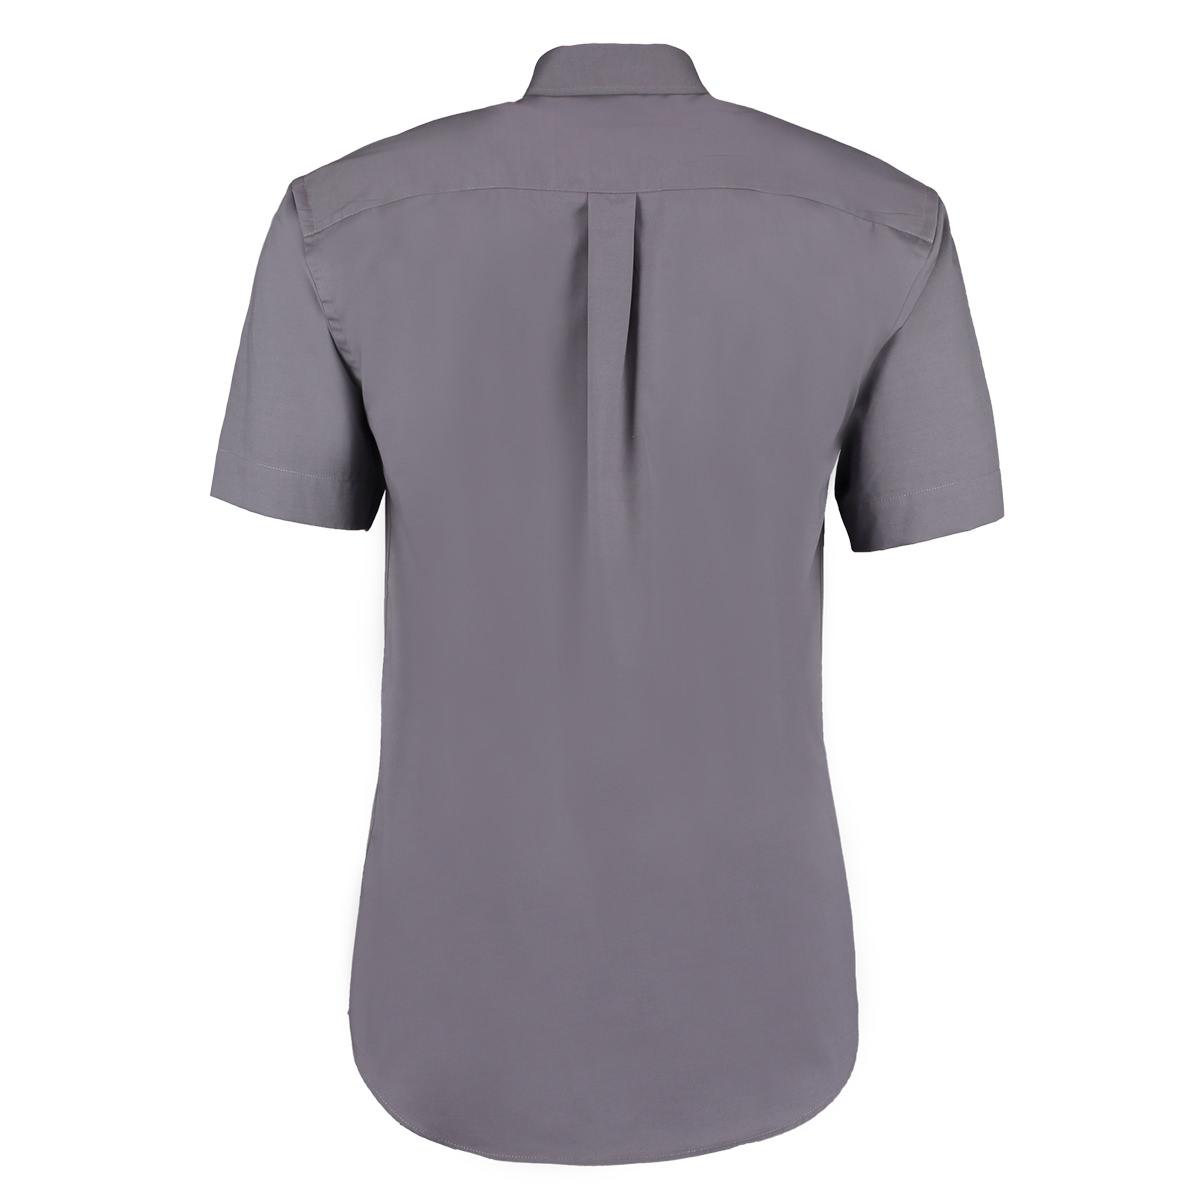 Kustom Kit Mens Short Sleeve Corporate Oxford Shirt Ebay